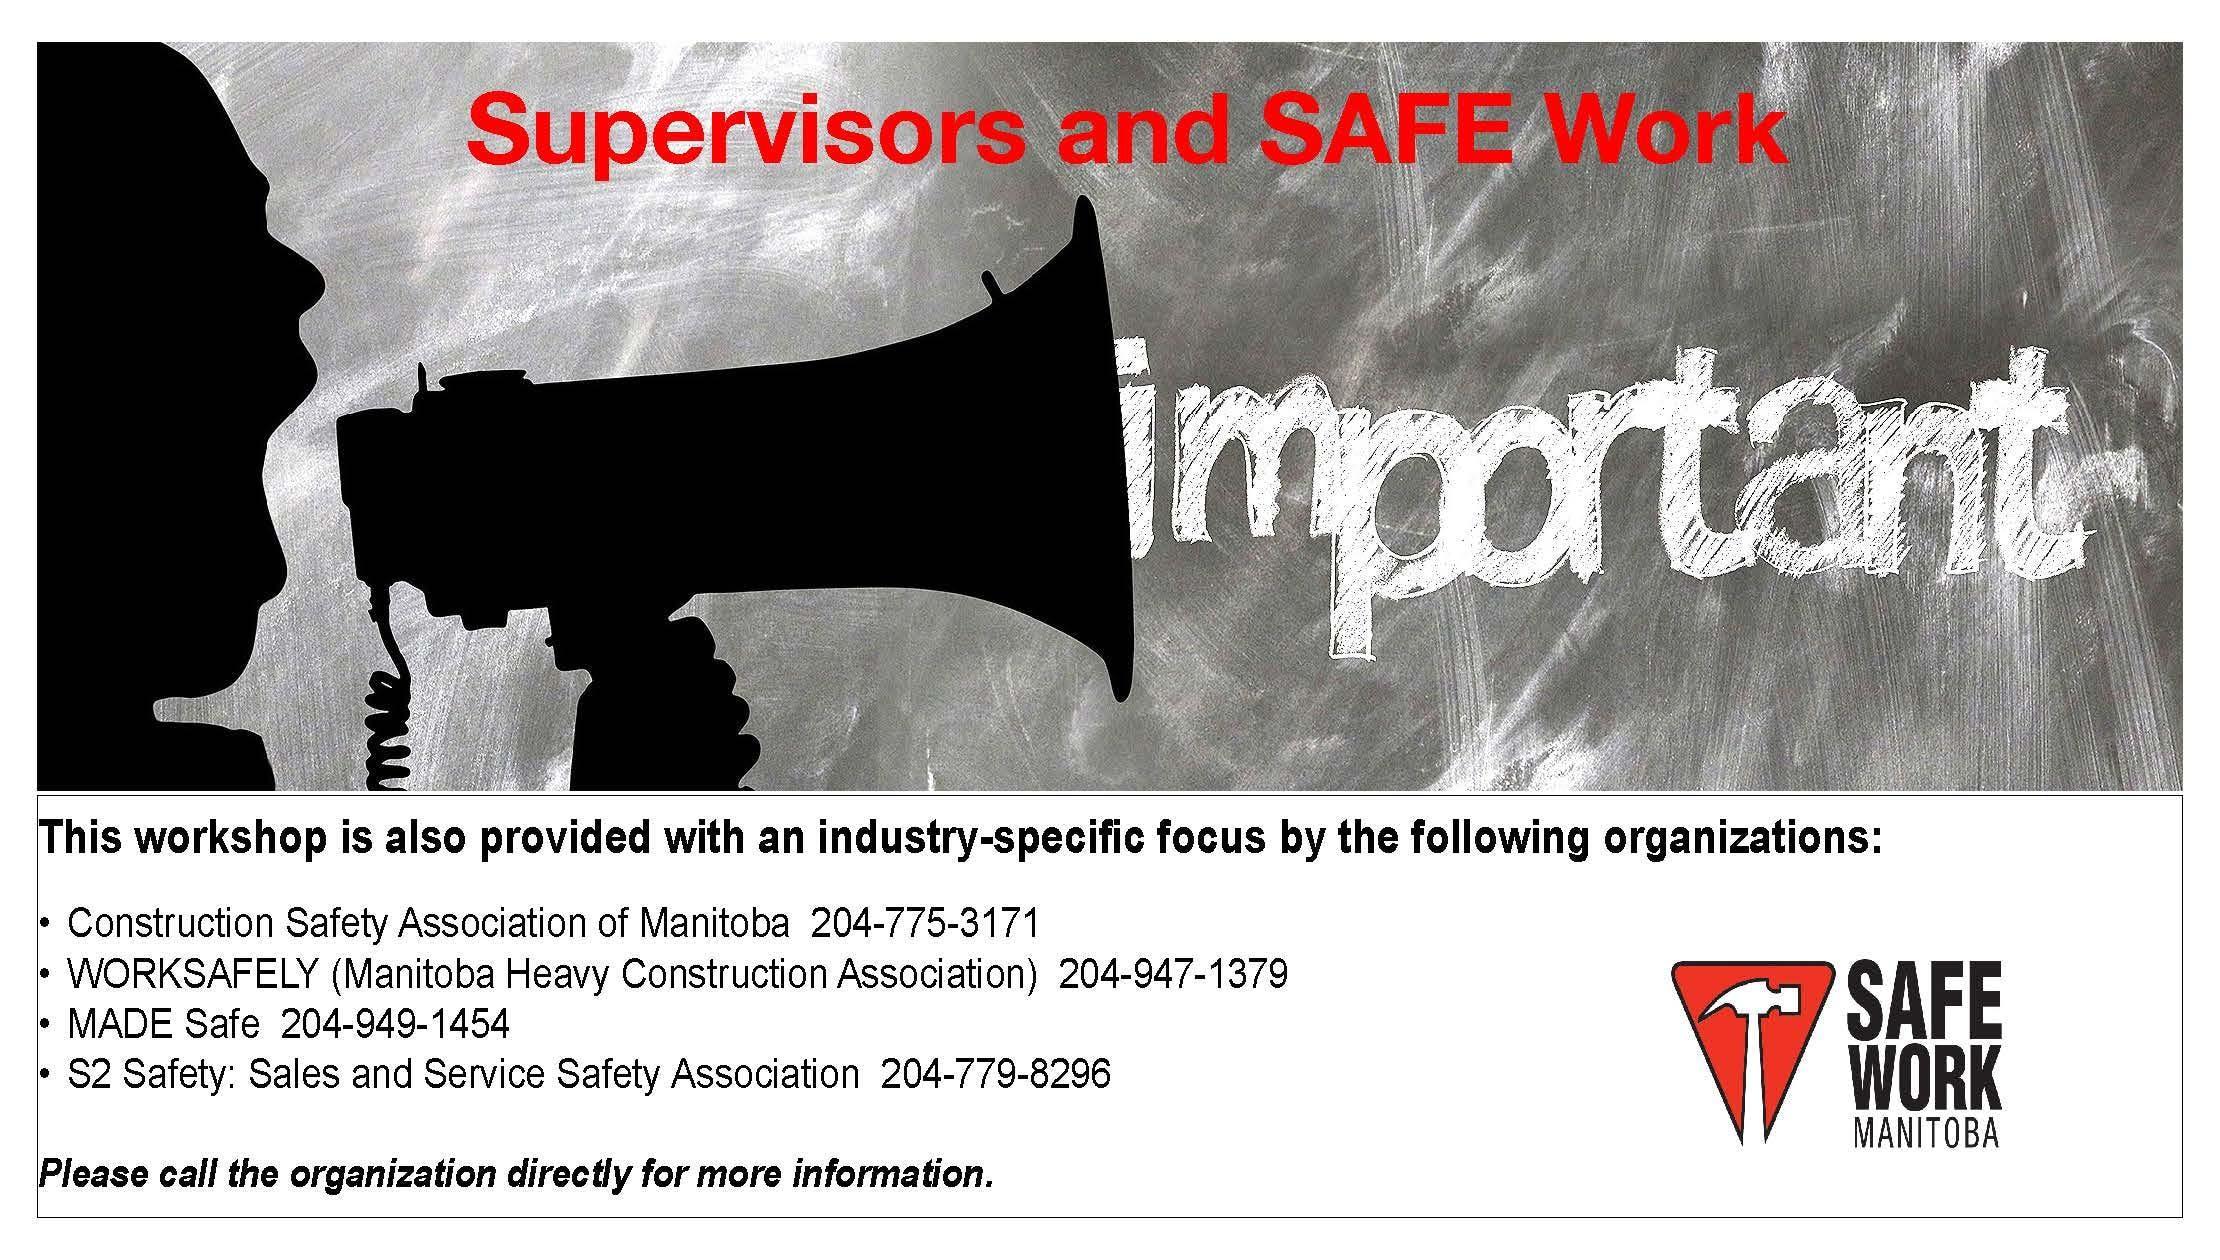 Supervisors and SAFE Work - Brandon MB